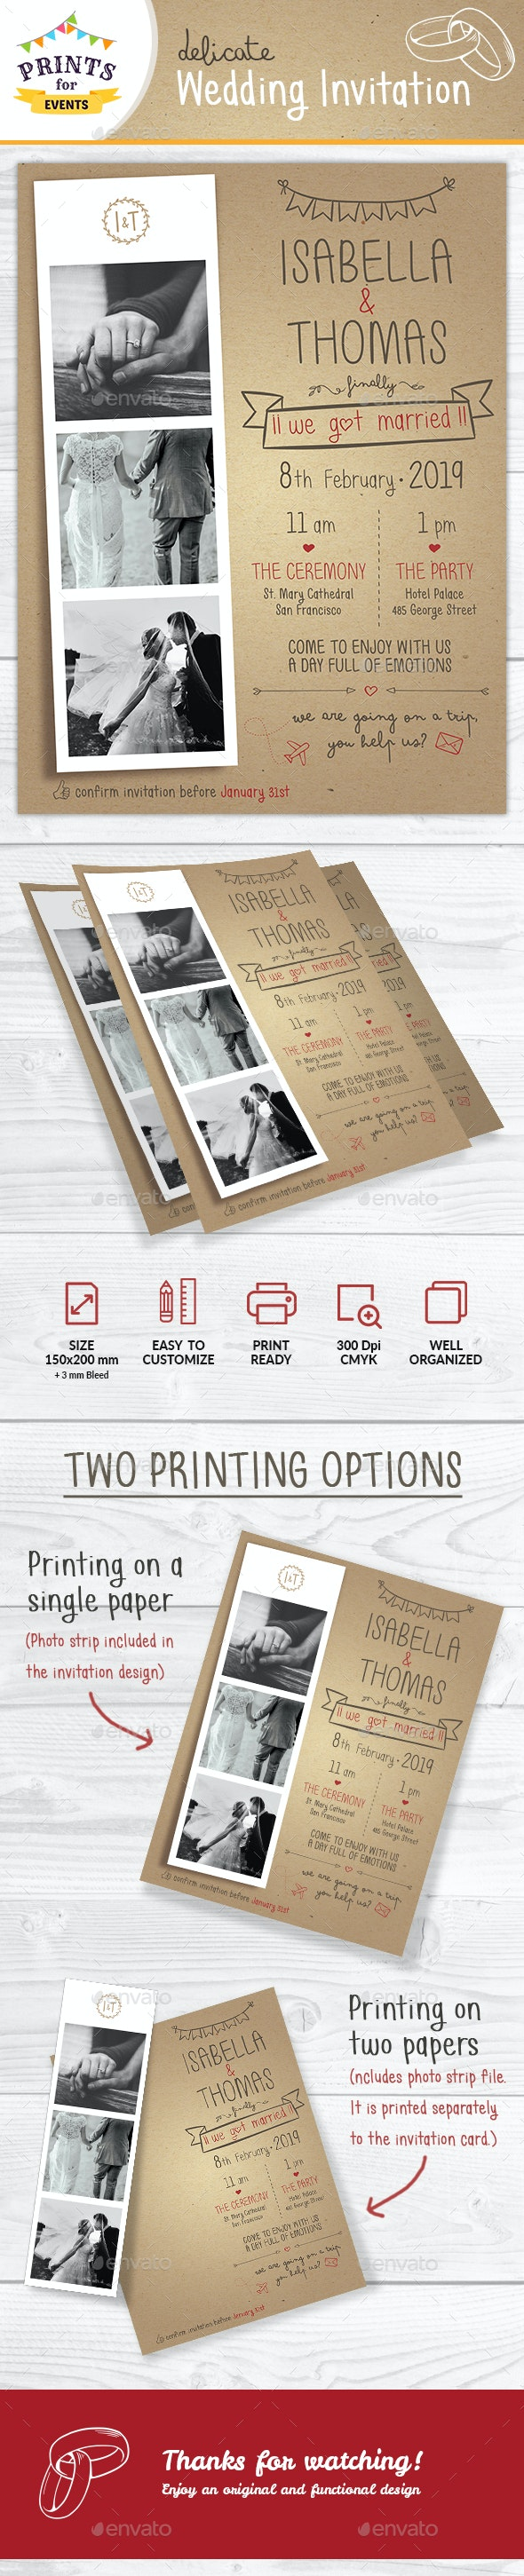 Delicate Wedding Invitation - Weddings Cards & Invites